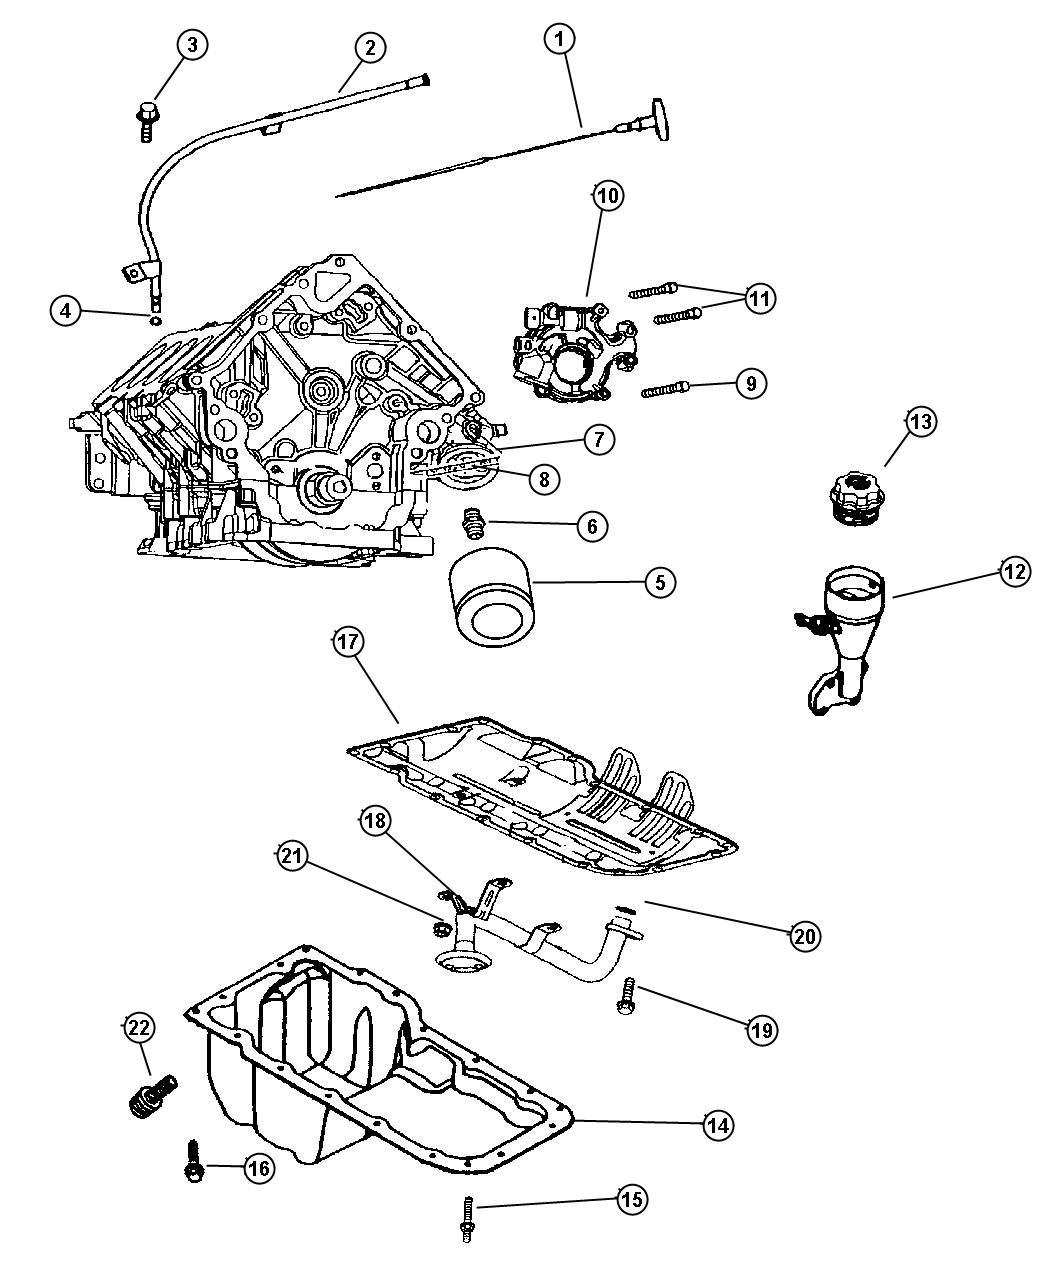 2006 Dodge Ram 2500 Engine Oiling 5 7l  Engine